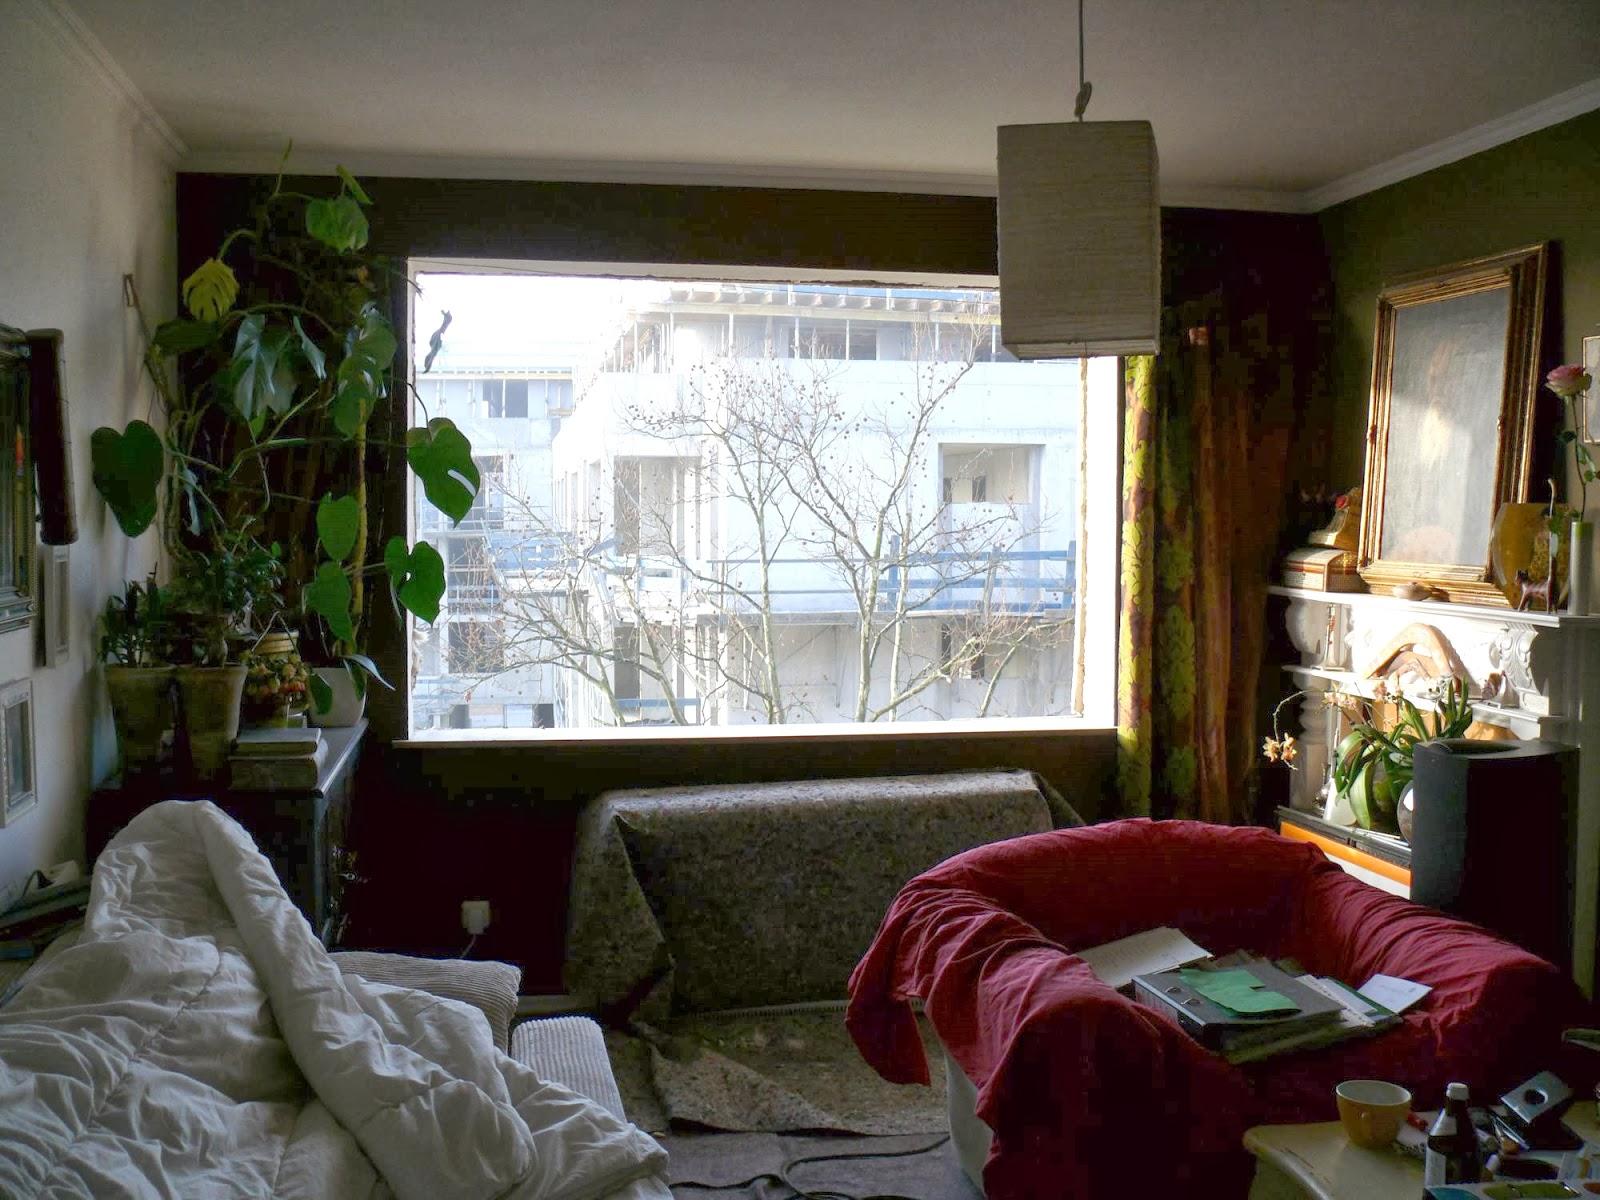 perlendschungel m rz 2014. Black Bedroom Furniture Sets. Home Design Ideas